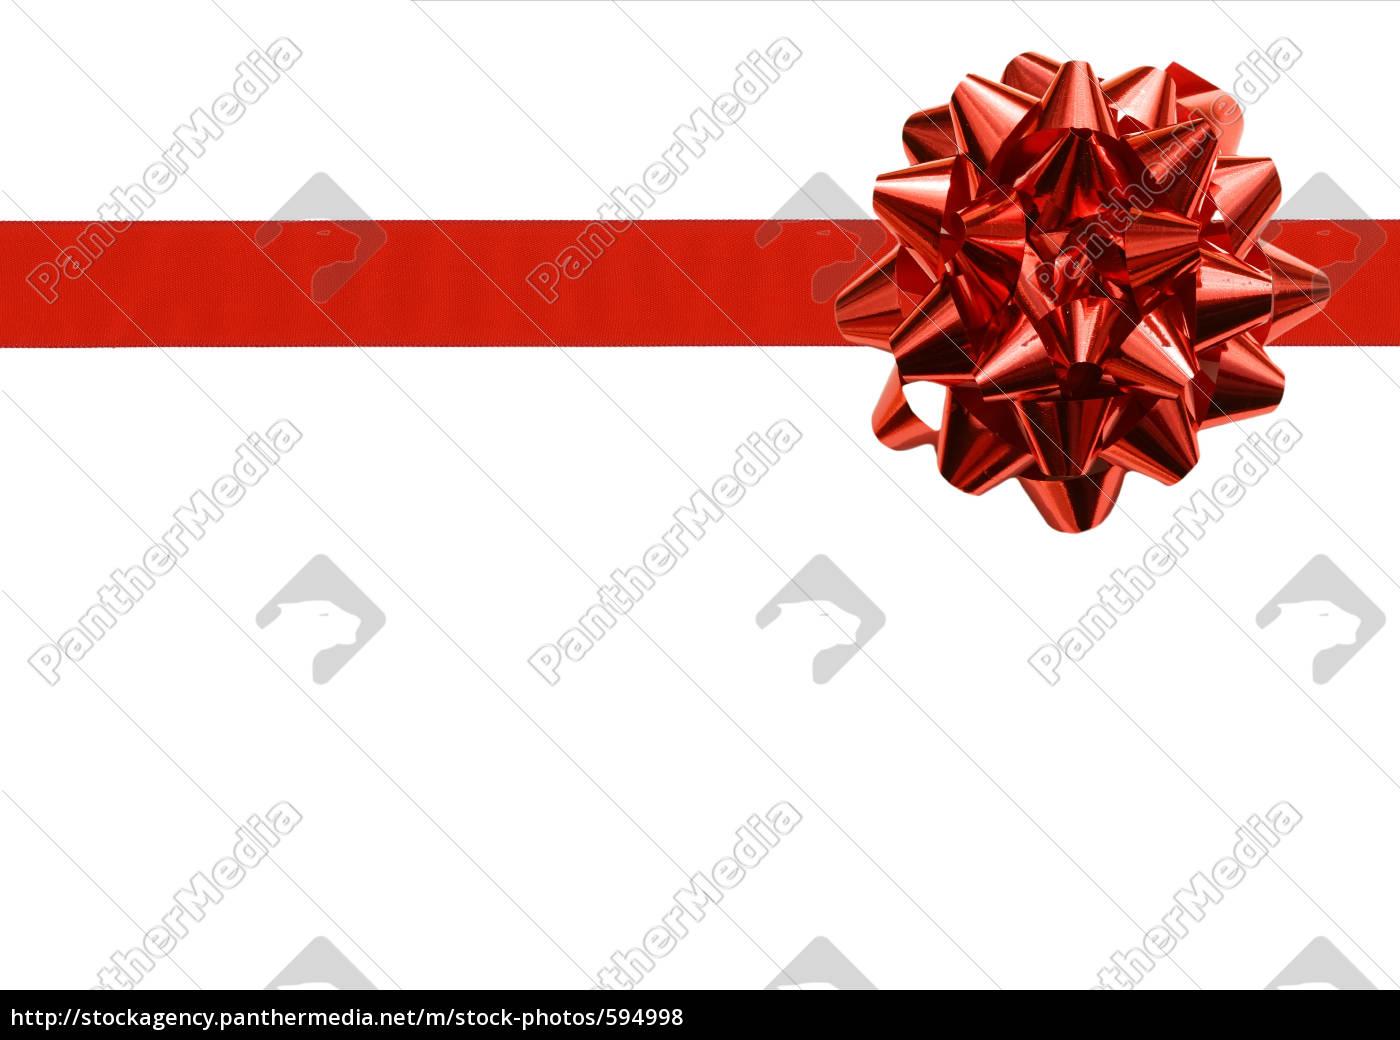 geschenkschleife - 594998